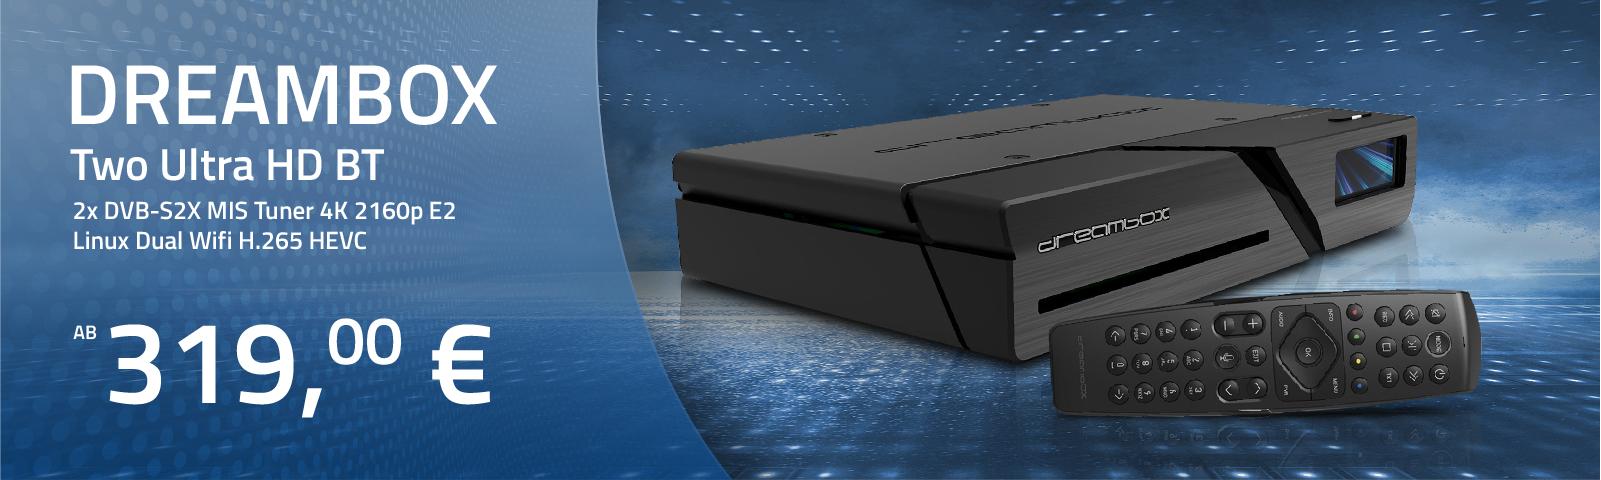 https://www.hm-sat-shop.de/receiver/sat-receiver/2283/dreambox-two-ultra-hd-bt-2x-dvb-s2x-mis-tuner-4k-2160p-e2-linux-dual-wifi-h.265-hevc?c=119